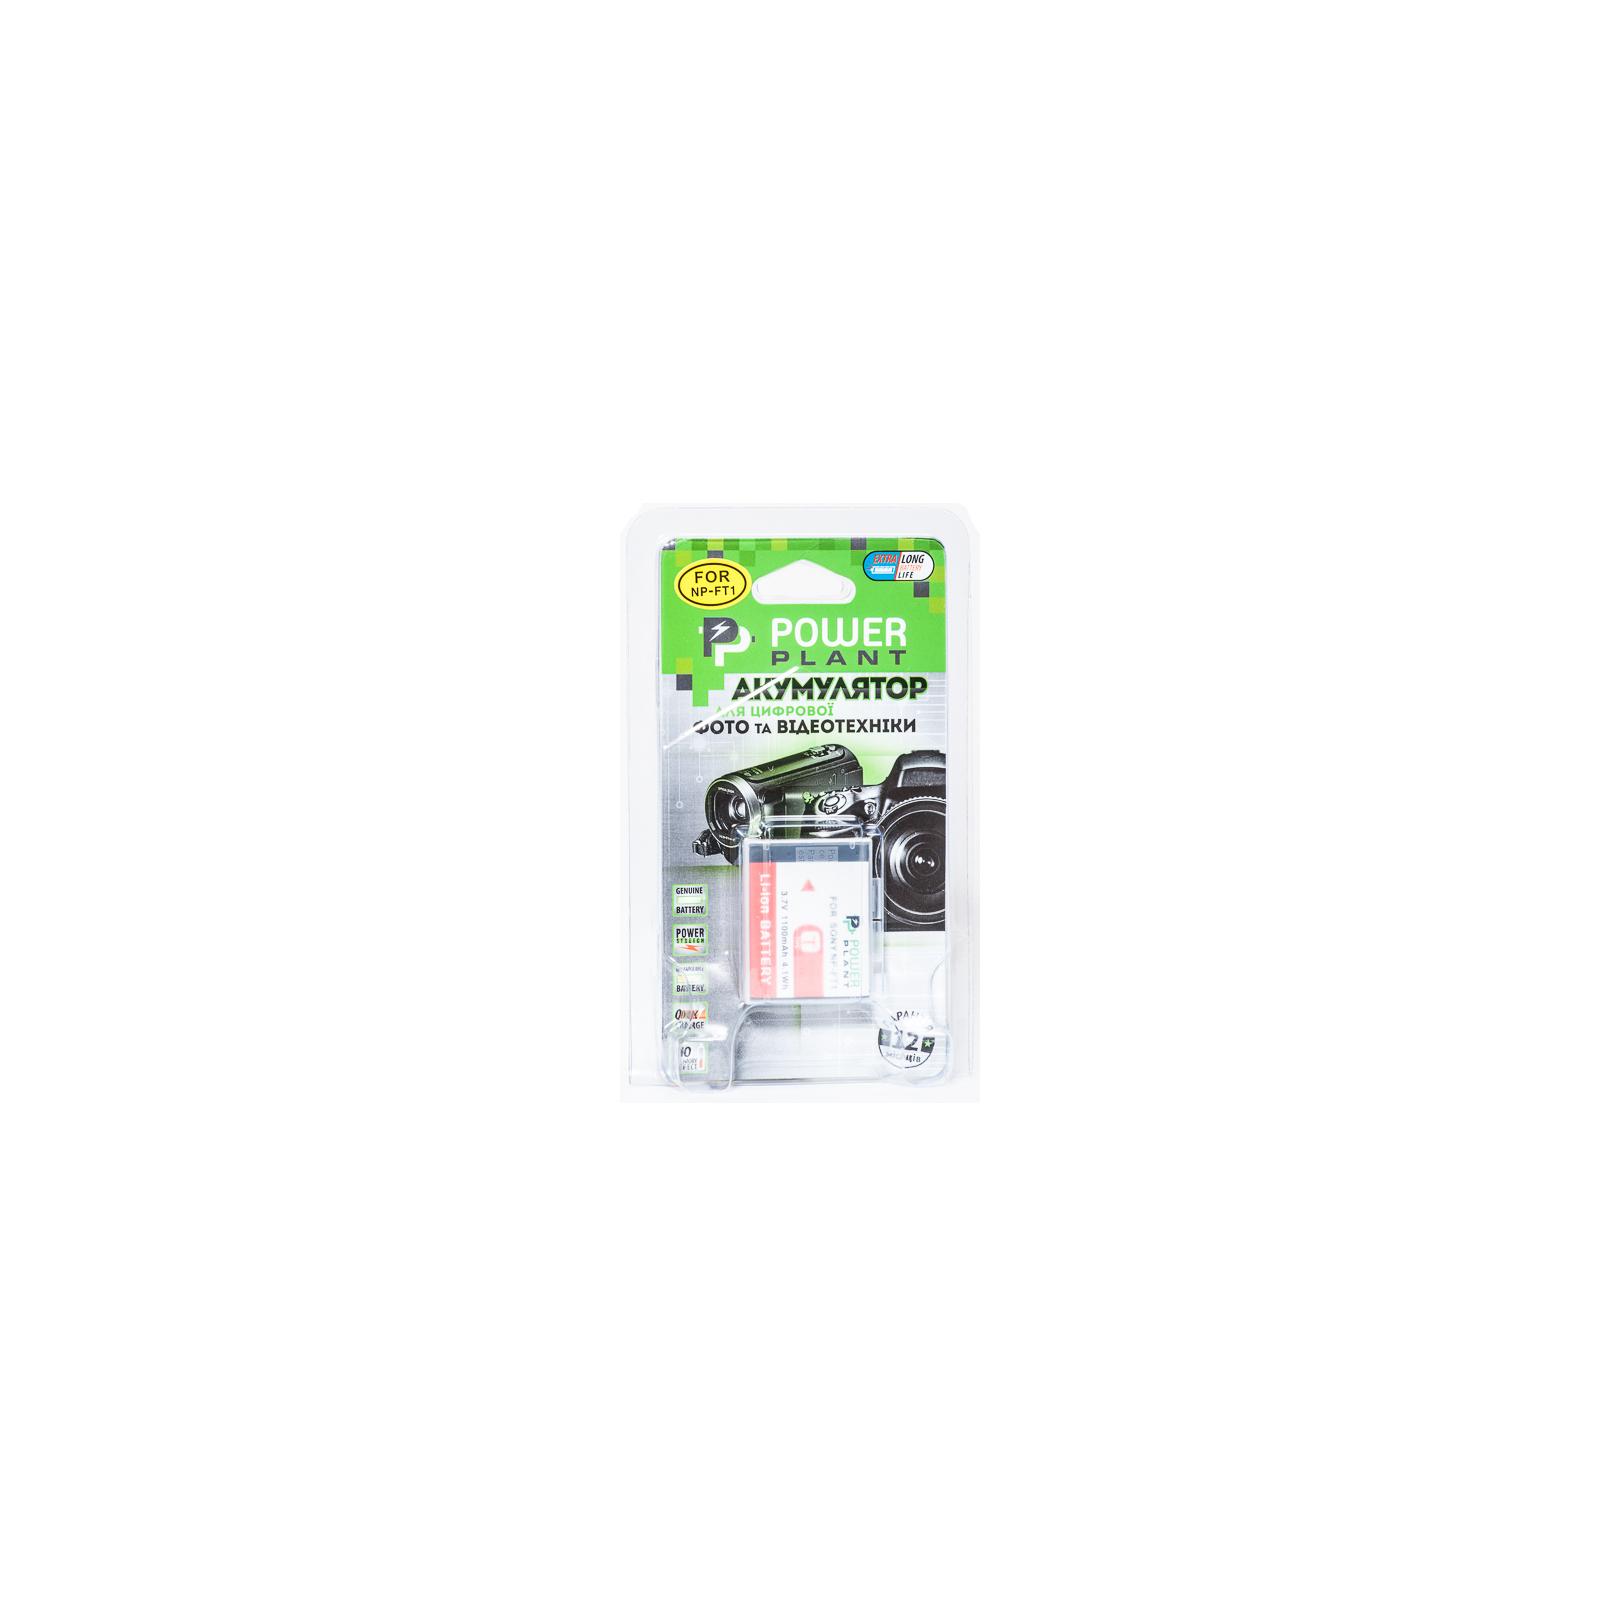 Аккумулятор к фото/видео PowerPlant Sony NP-FT1 (DV00DV1020) изображение 3